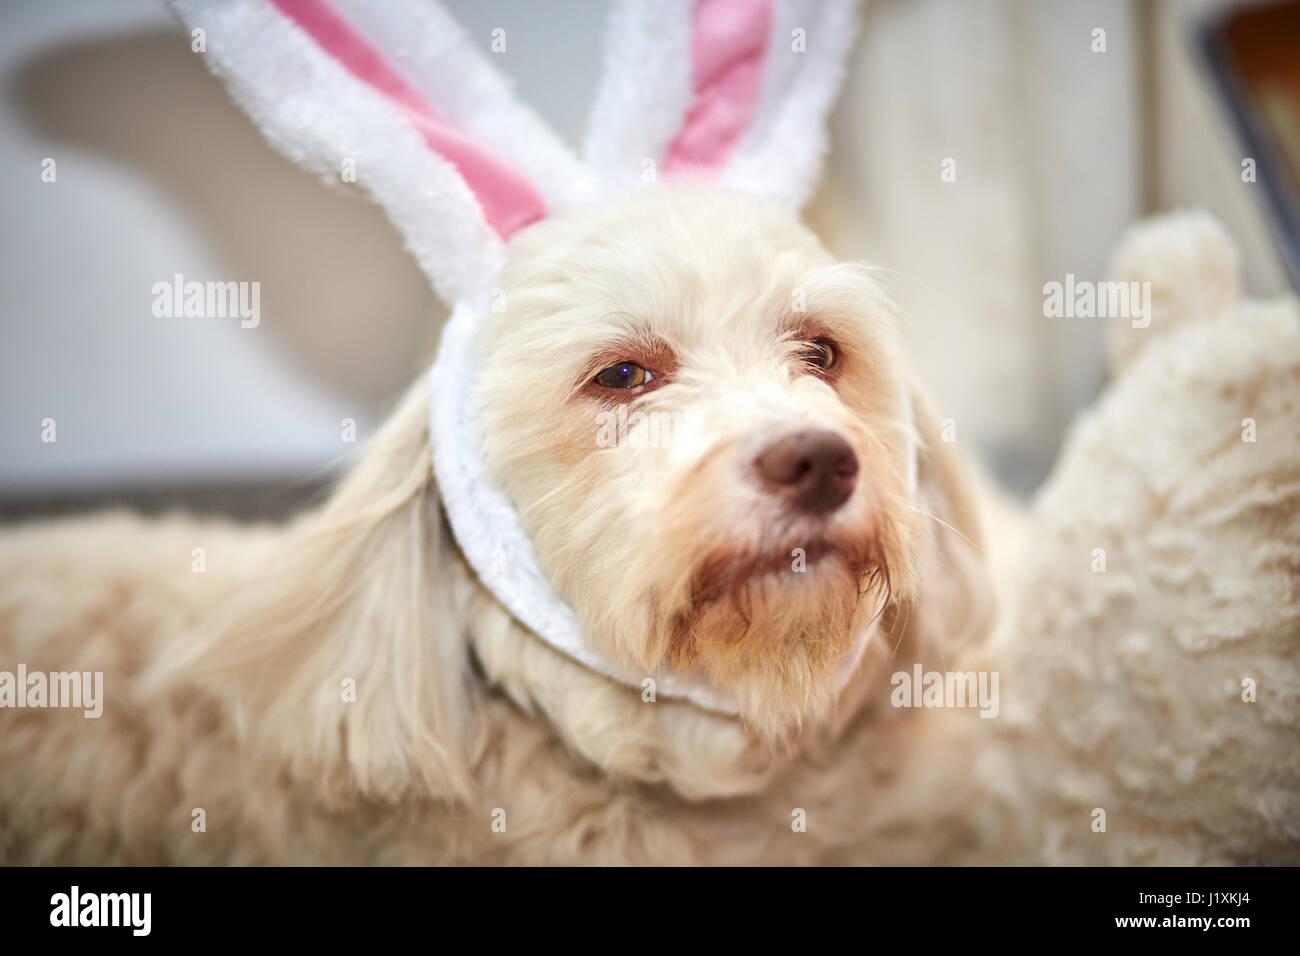 havanese dog with funny easter bunny ears stock photo 138883756 alamy